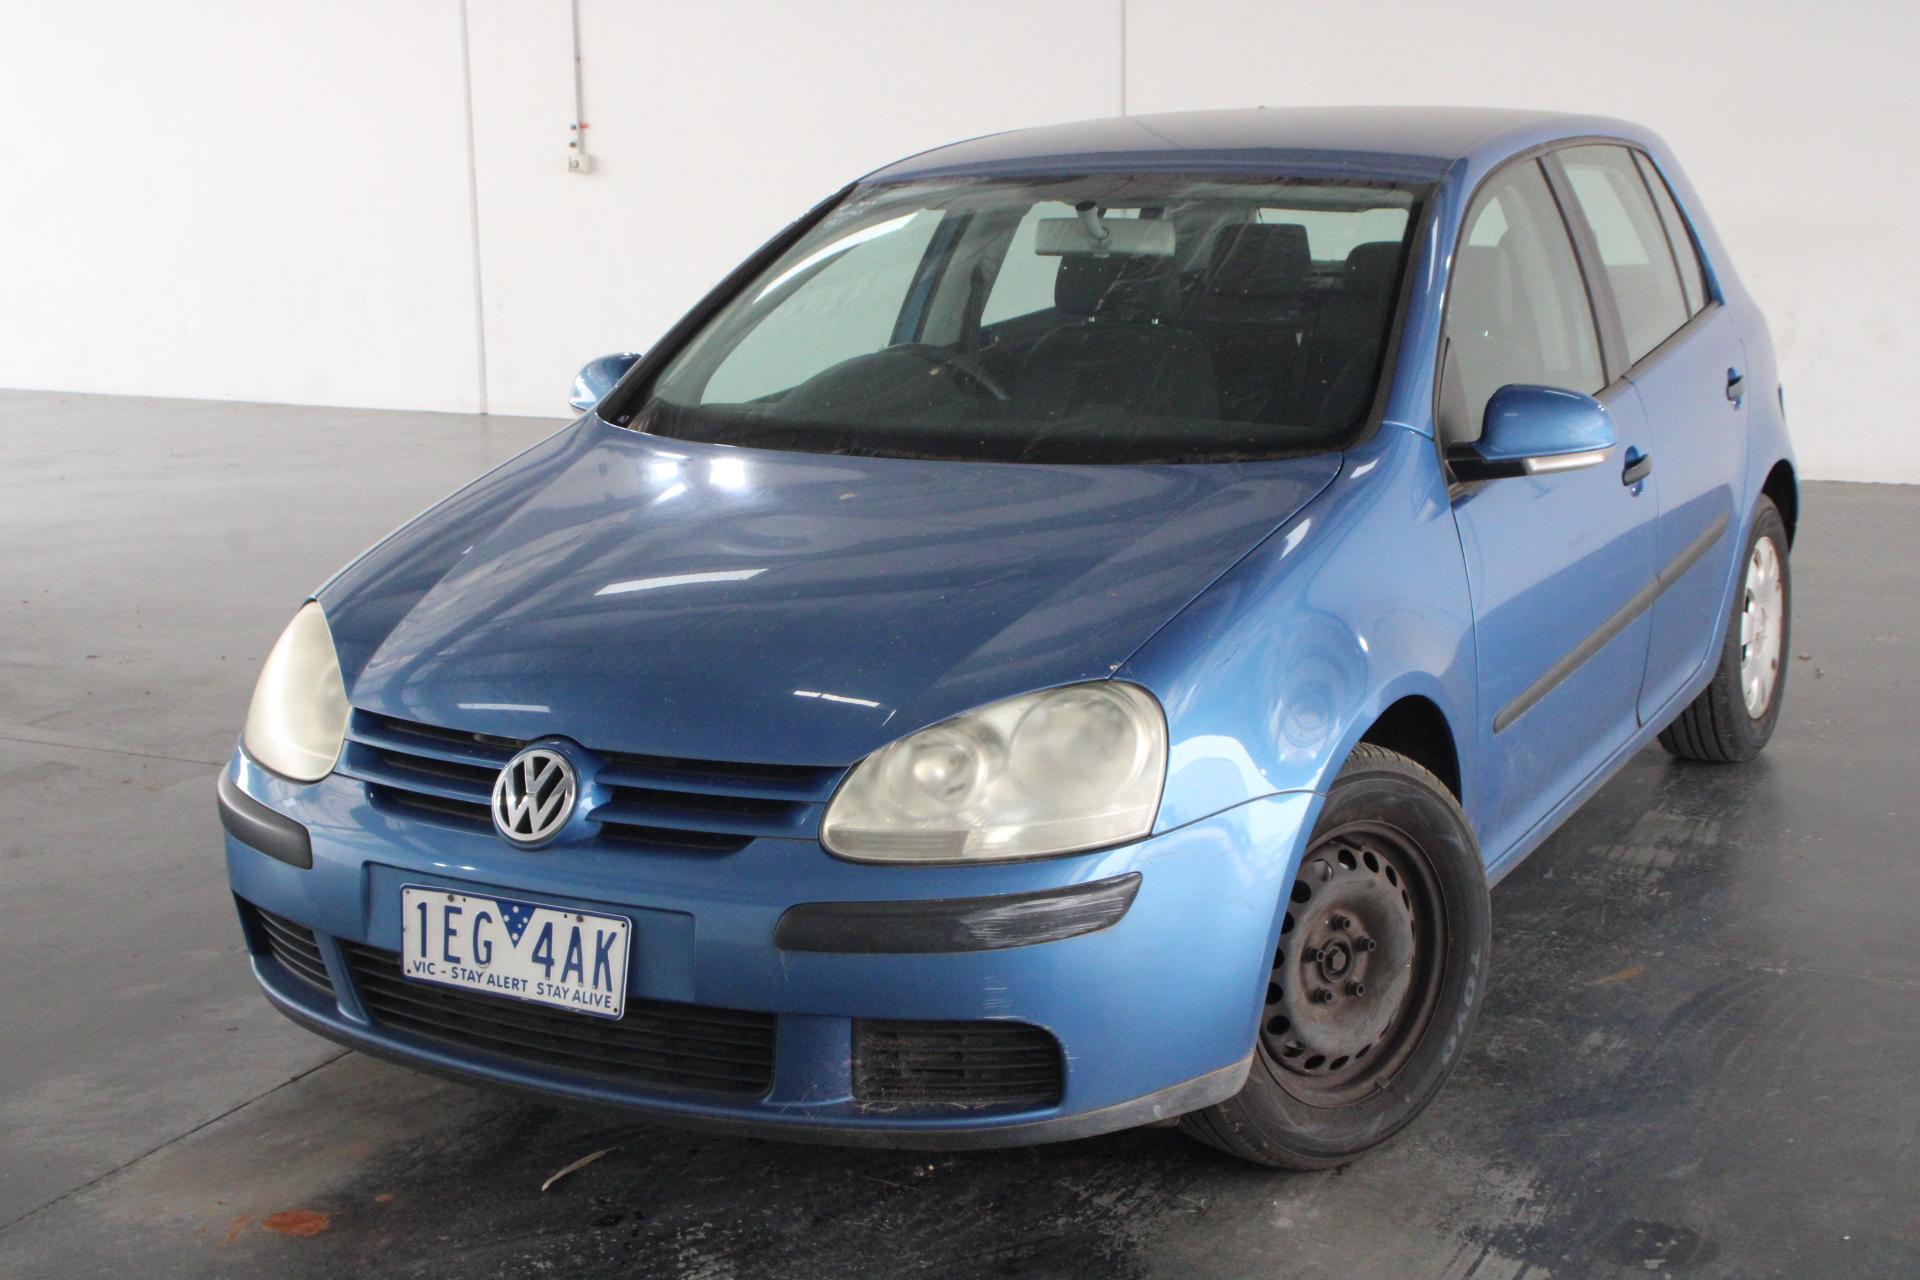 2004 Volkswagen Golf 1.6 Trendline 1k Manual Hatchback